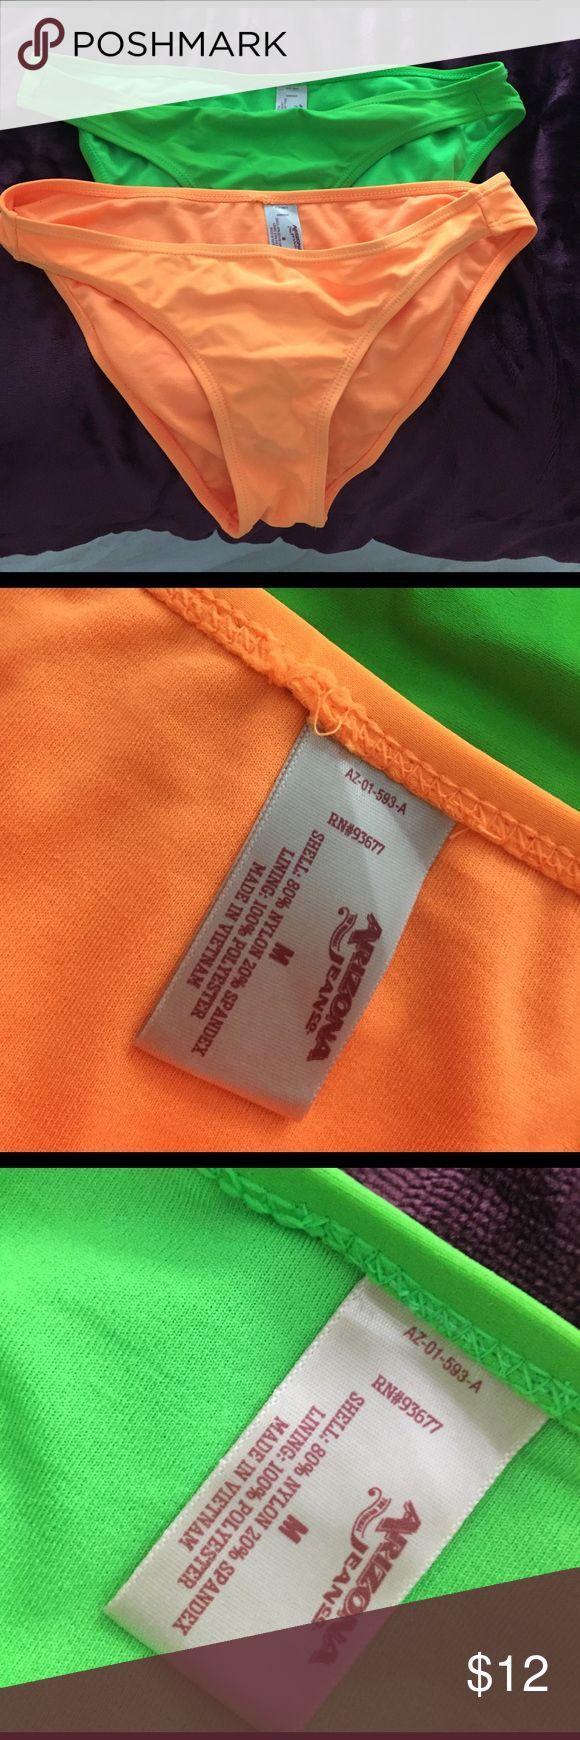 Bikini bottoms Never worn, green and orange bikini bottoms Arizona Jean Company Swim Bikinis